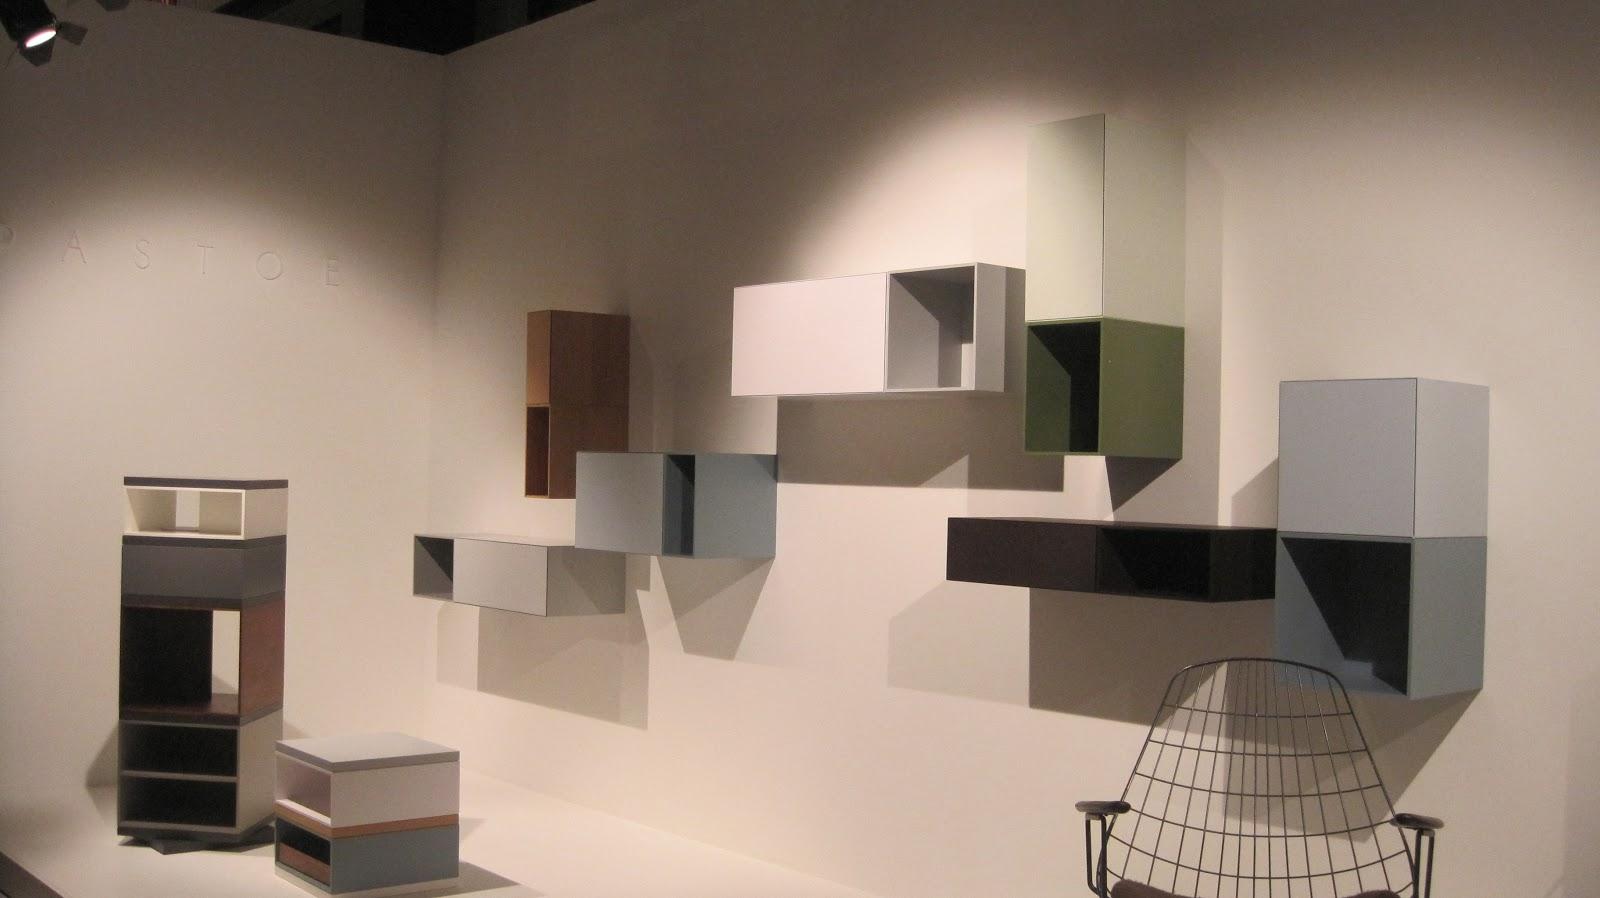 Architecture gip interieur kortrijk for Gulden interieur